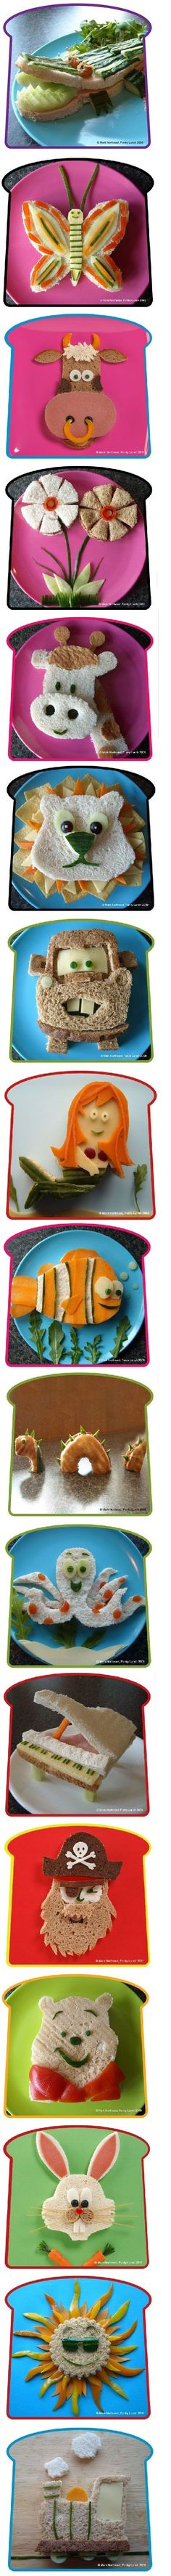 Fantastic kids sandwich creations!